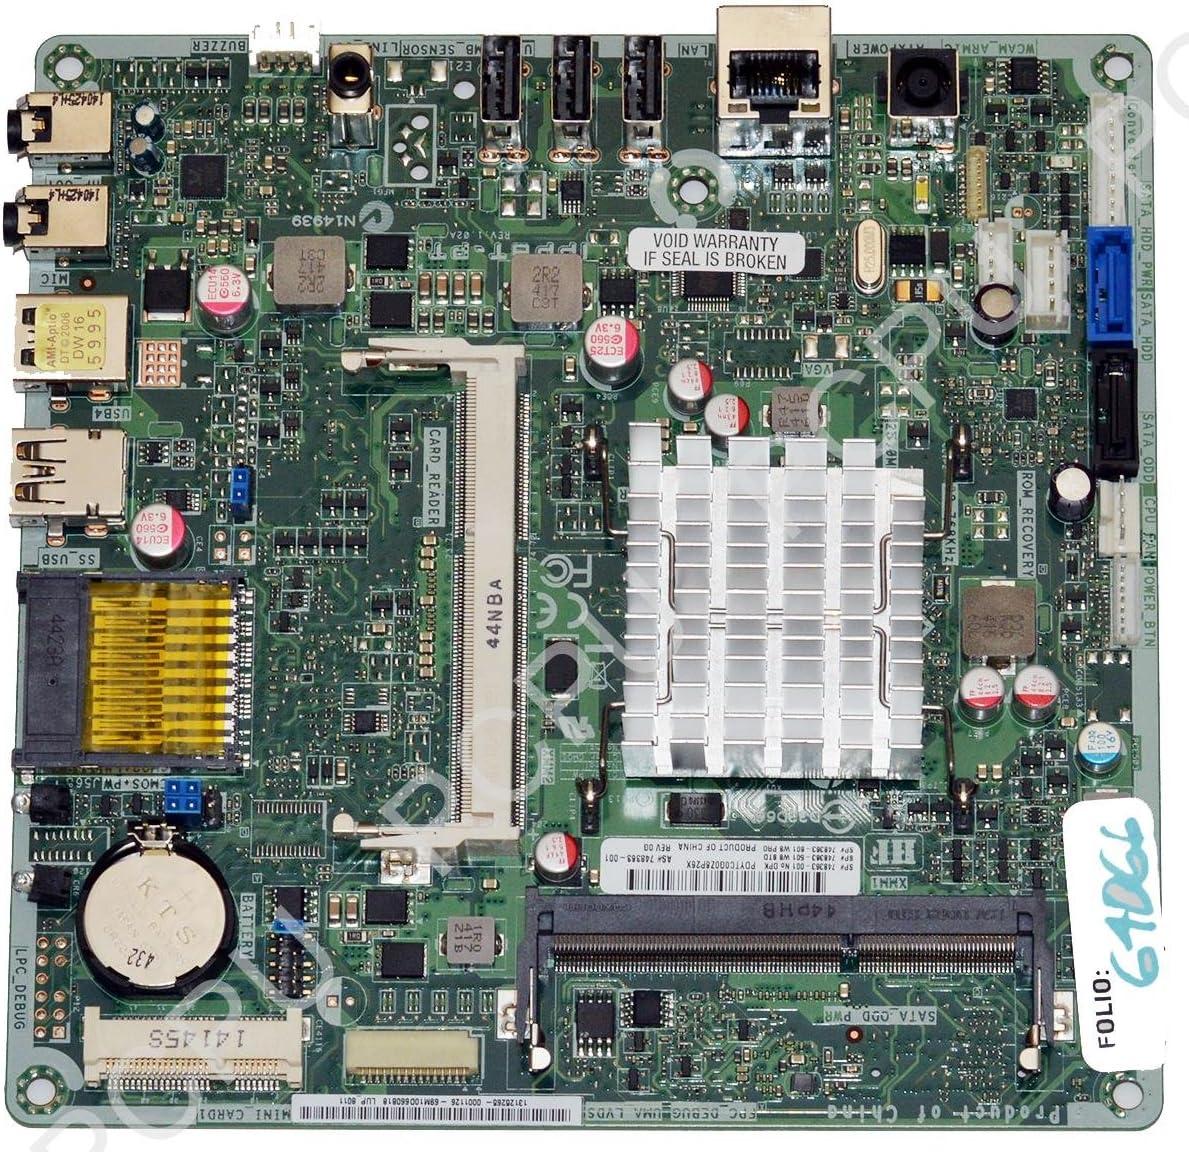 "748363-001 HP 19-2113W 19"" AIO Lupin-C Motherboard w/Intel Pentium J2900 2.67GHz CPU"